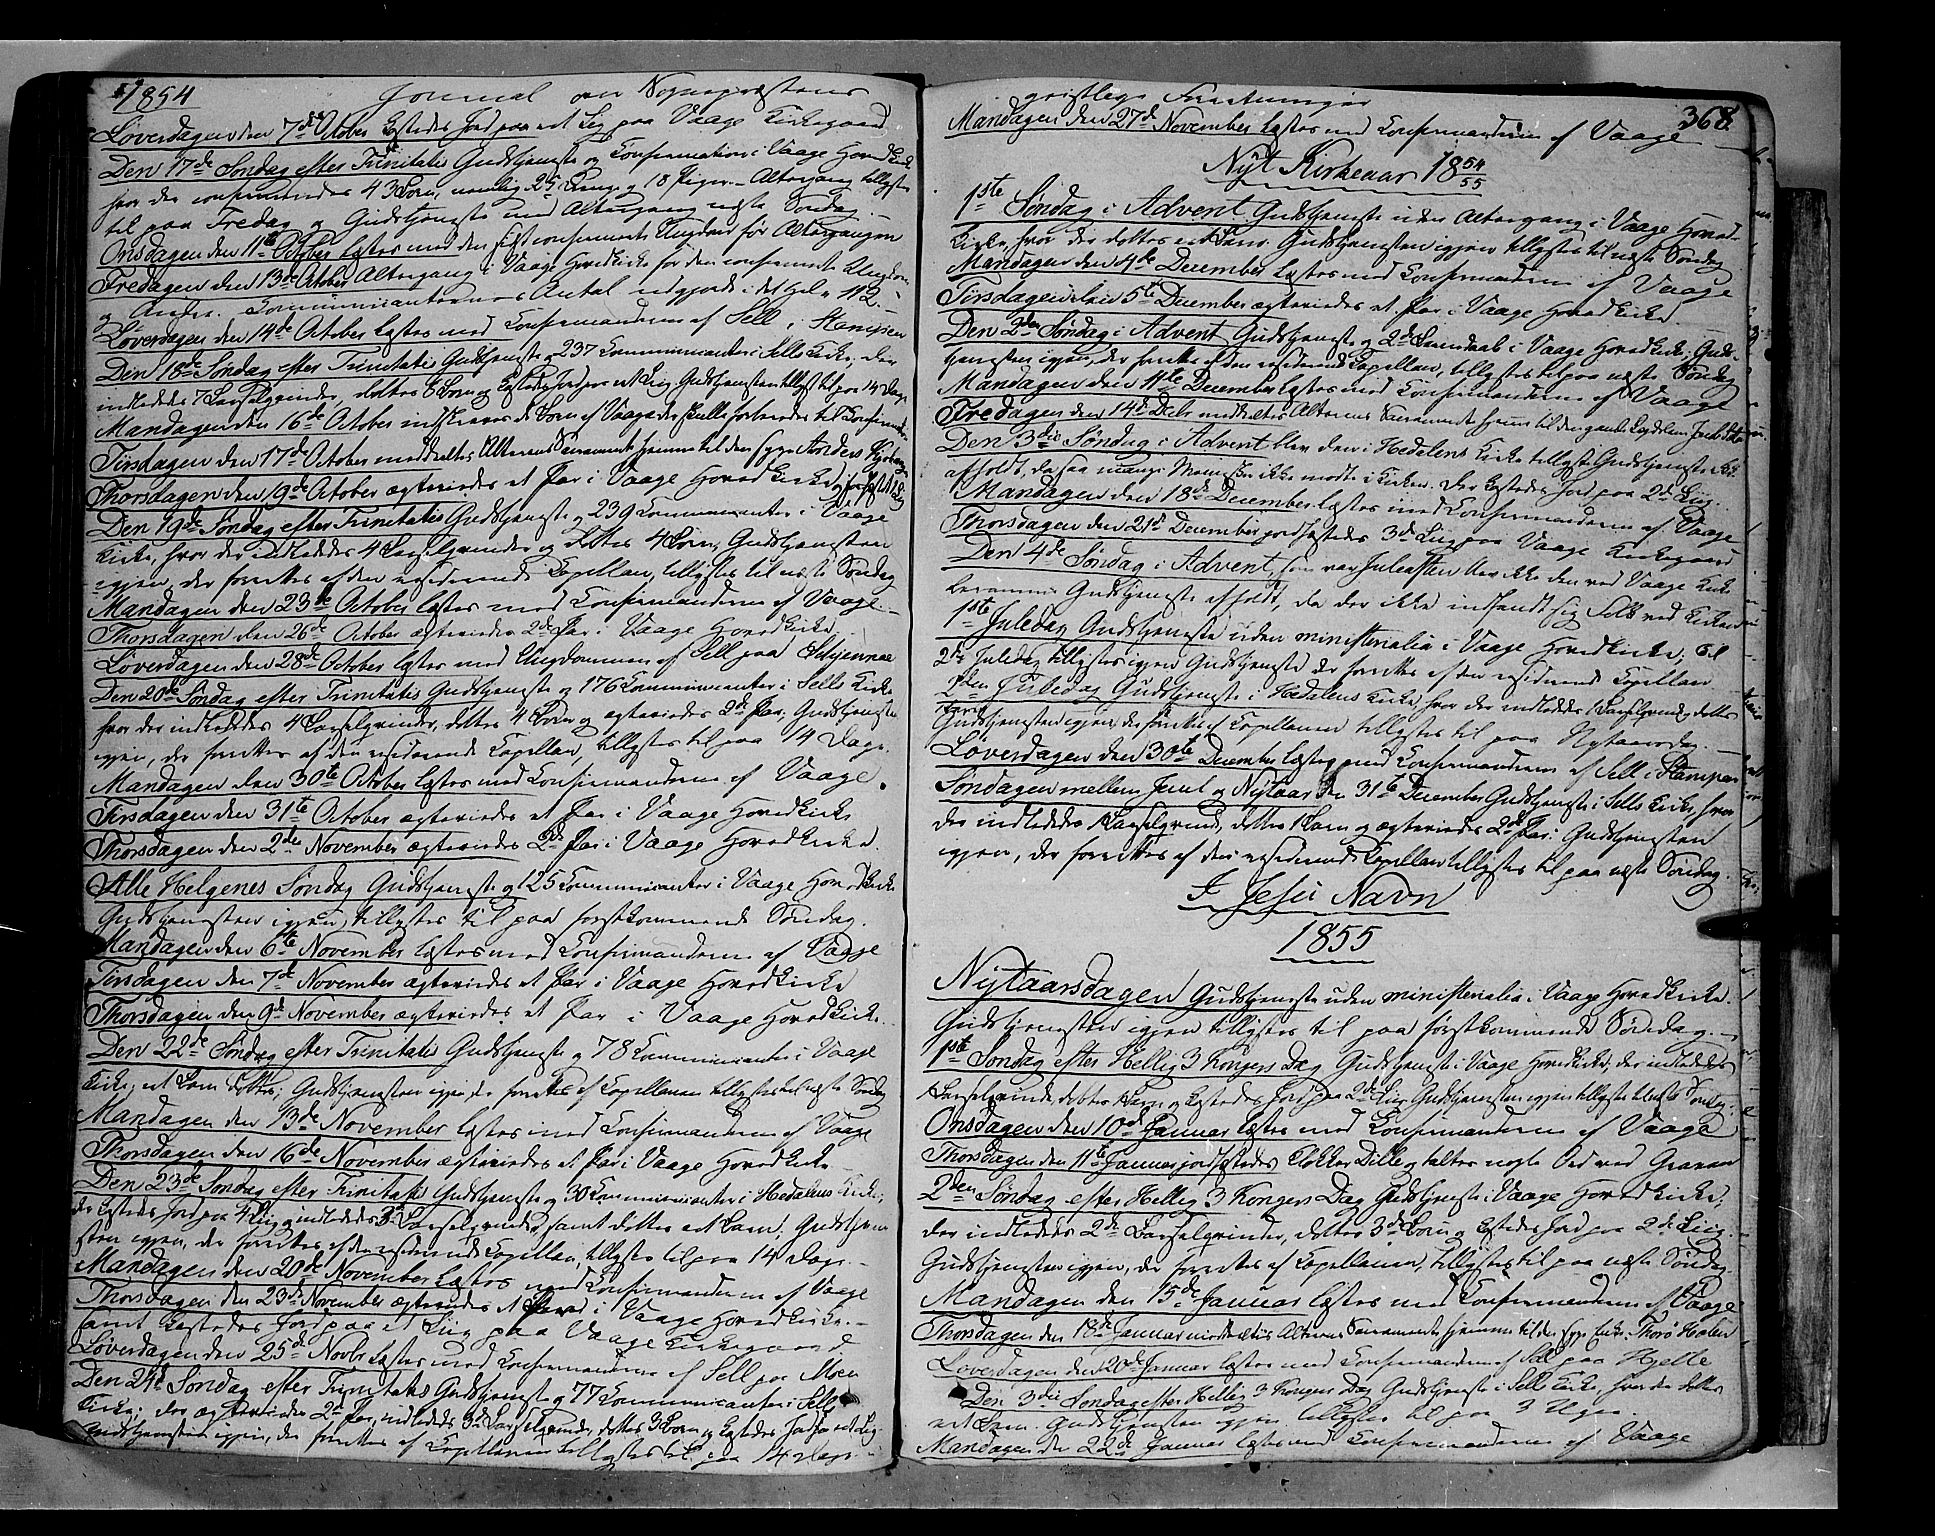 SAH, Vågå prestekontor, Ministerialbok nr. 5 /1, 1842-1856, s. 368